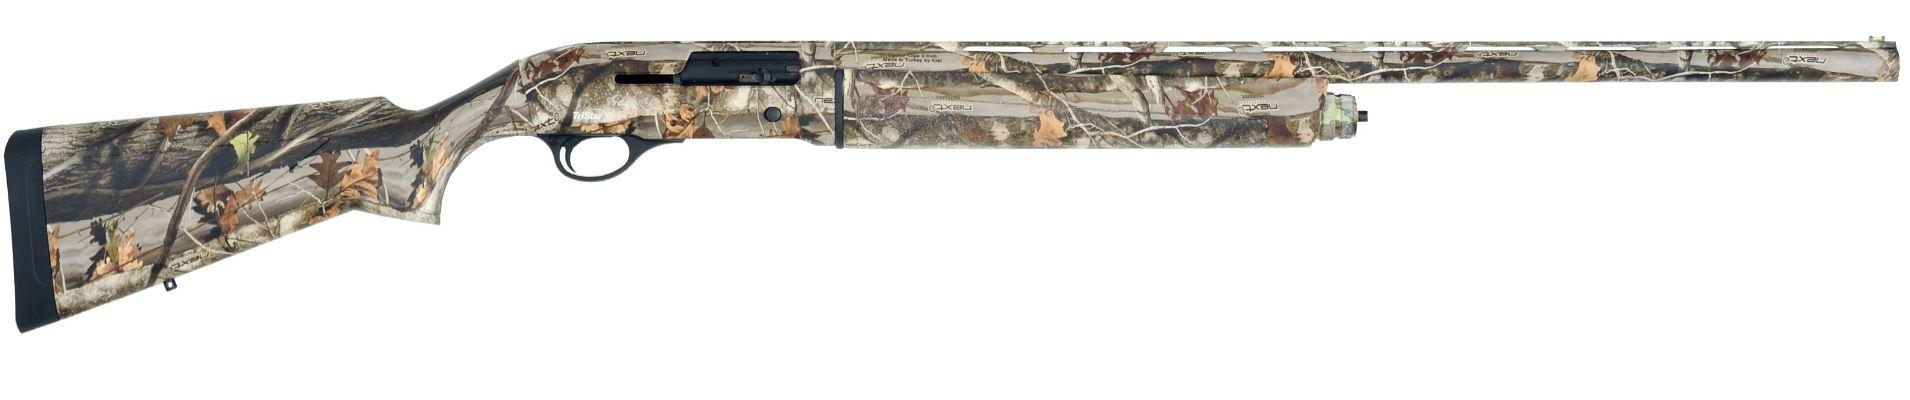 TriStar Sporting Arms RAPTOR 12 GAUGE